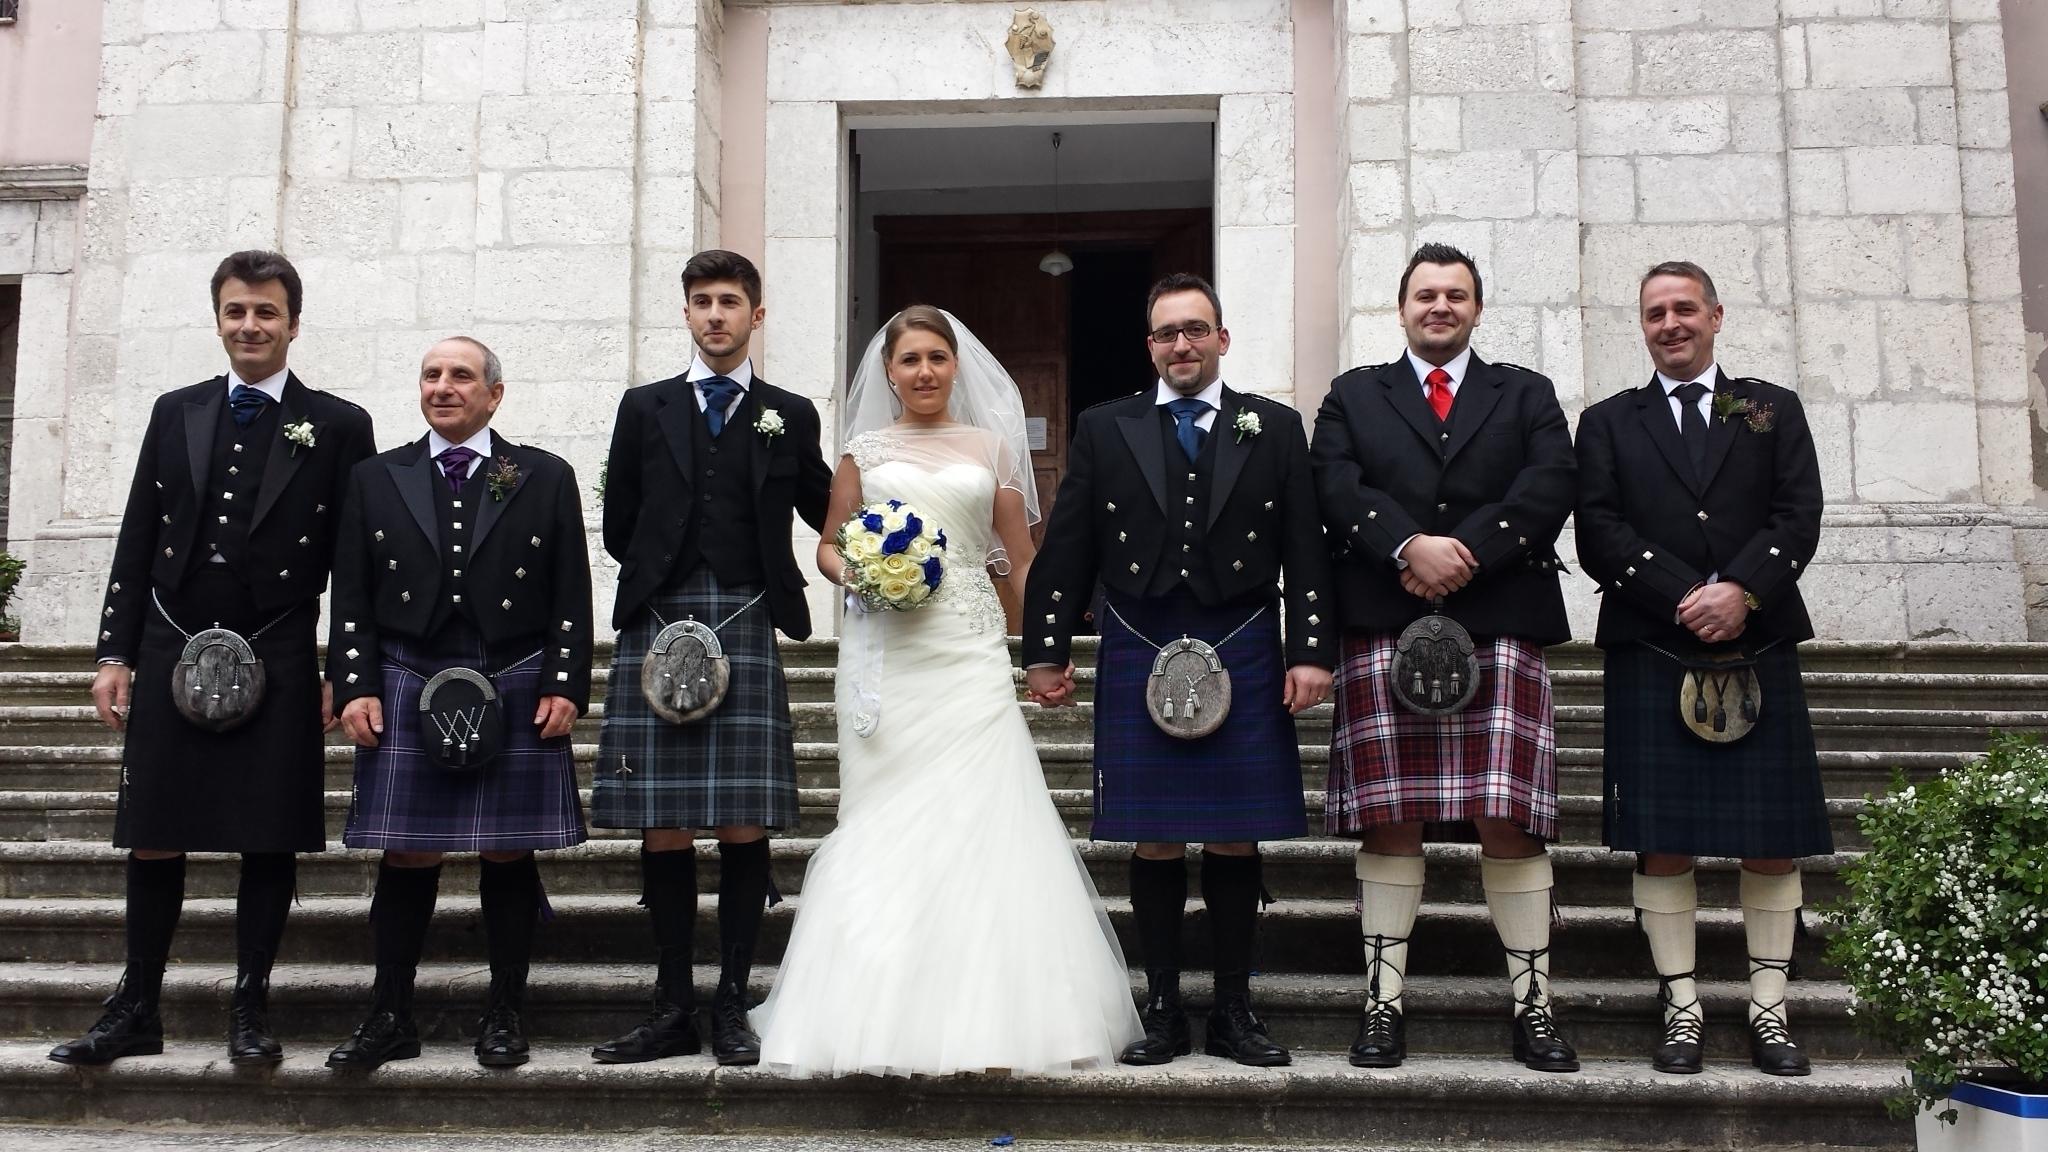 Matrimonio In Kilt : Atripalda news cultura da edimburgo ad per